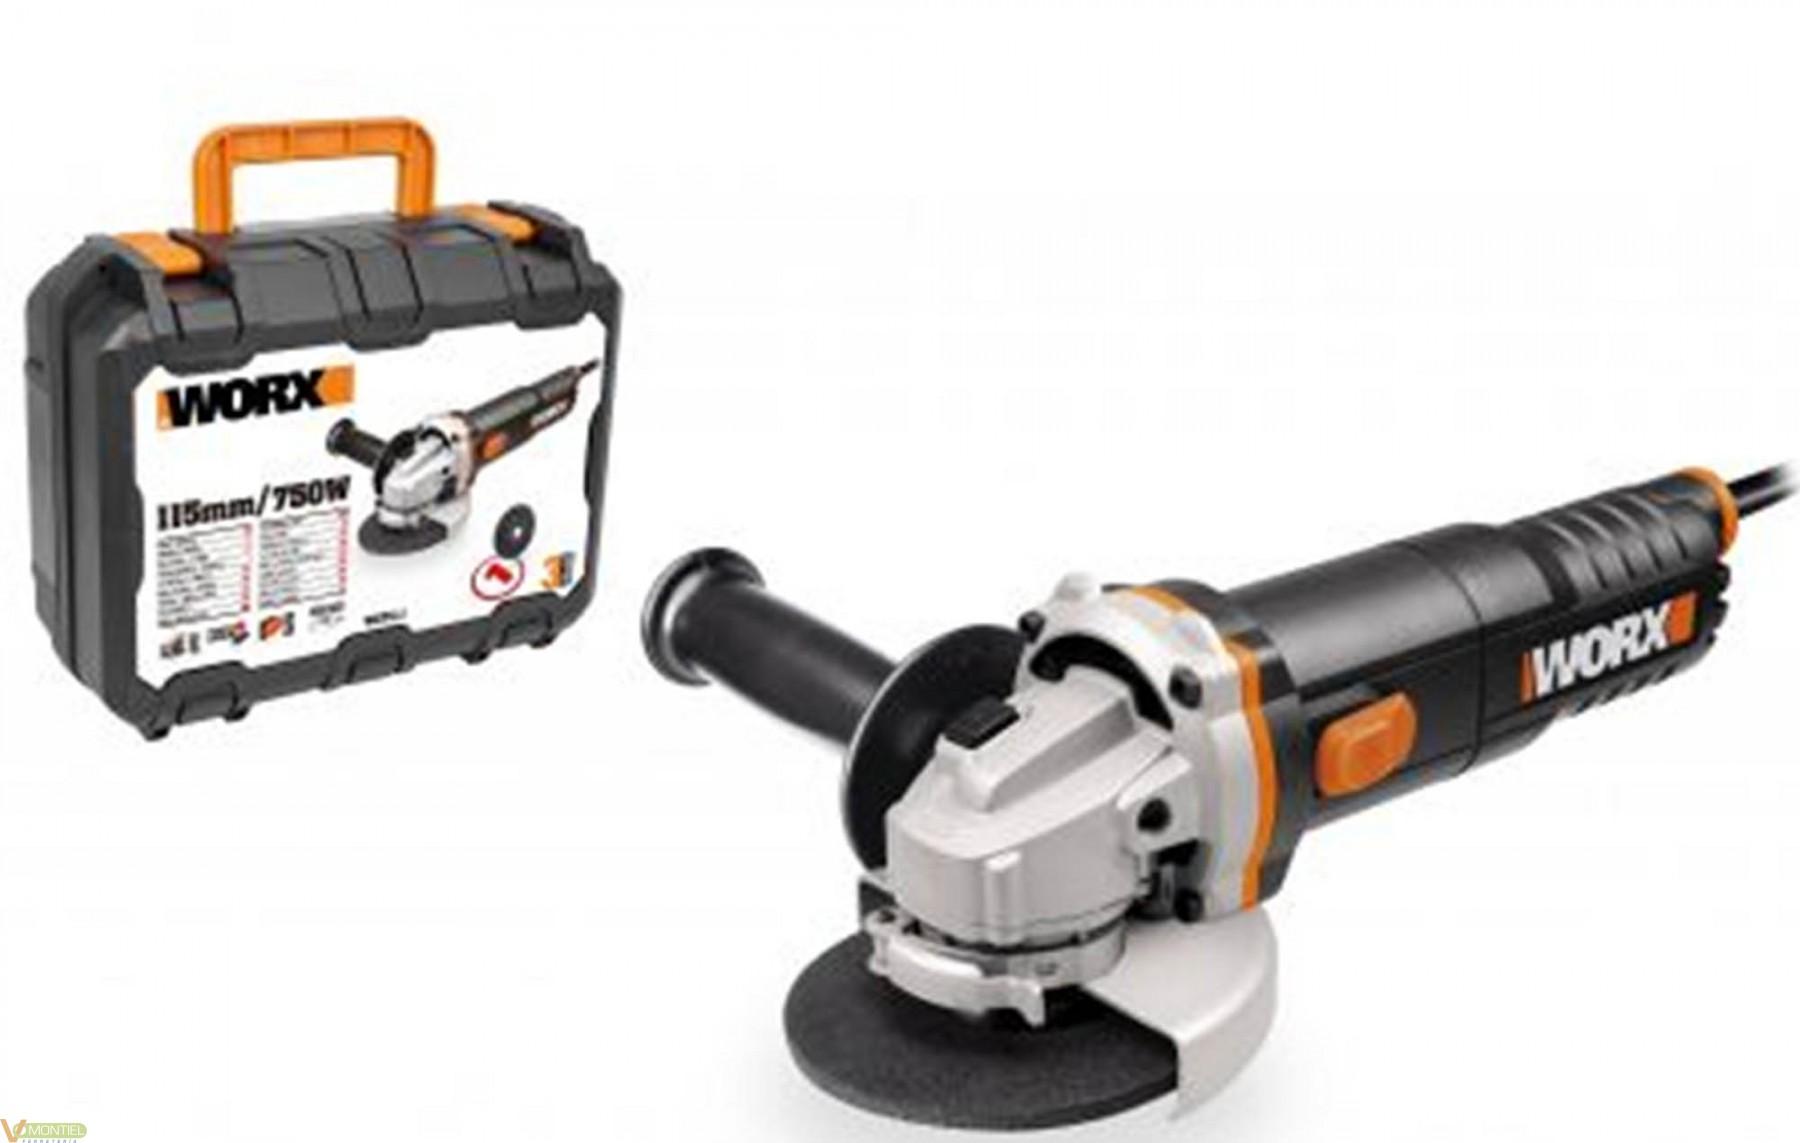 Amoladora 115 mm 750w-0